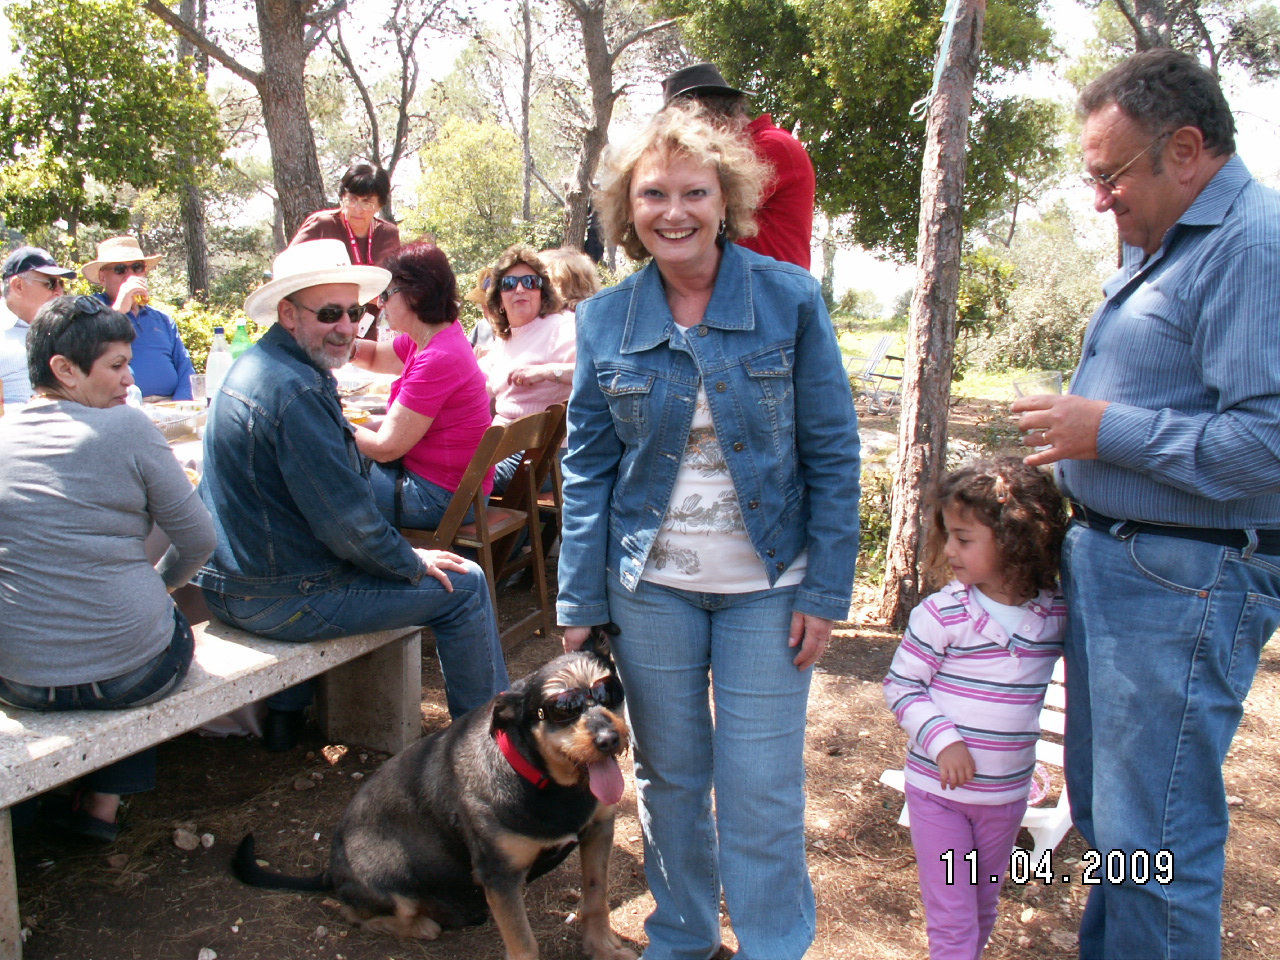 Mama, Dan si Bubu la un picnic cu prietenii